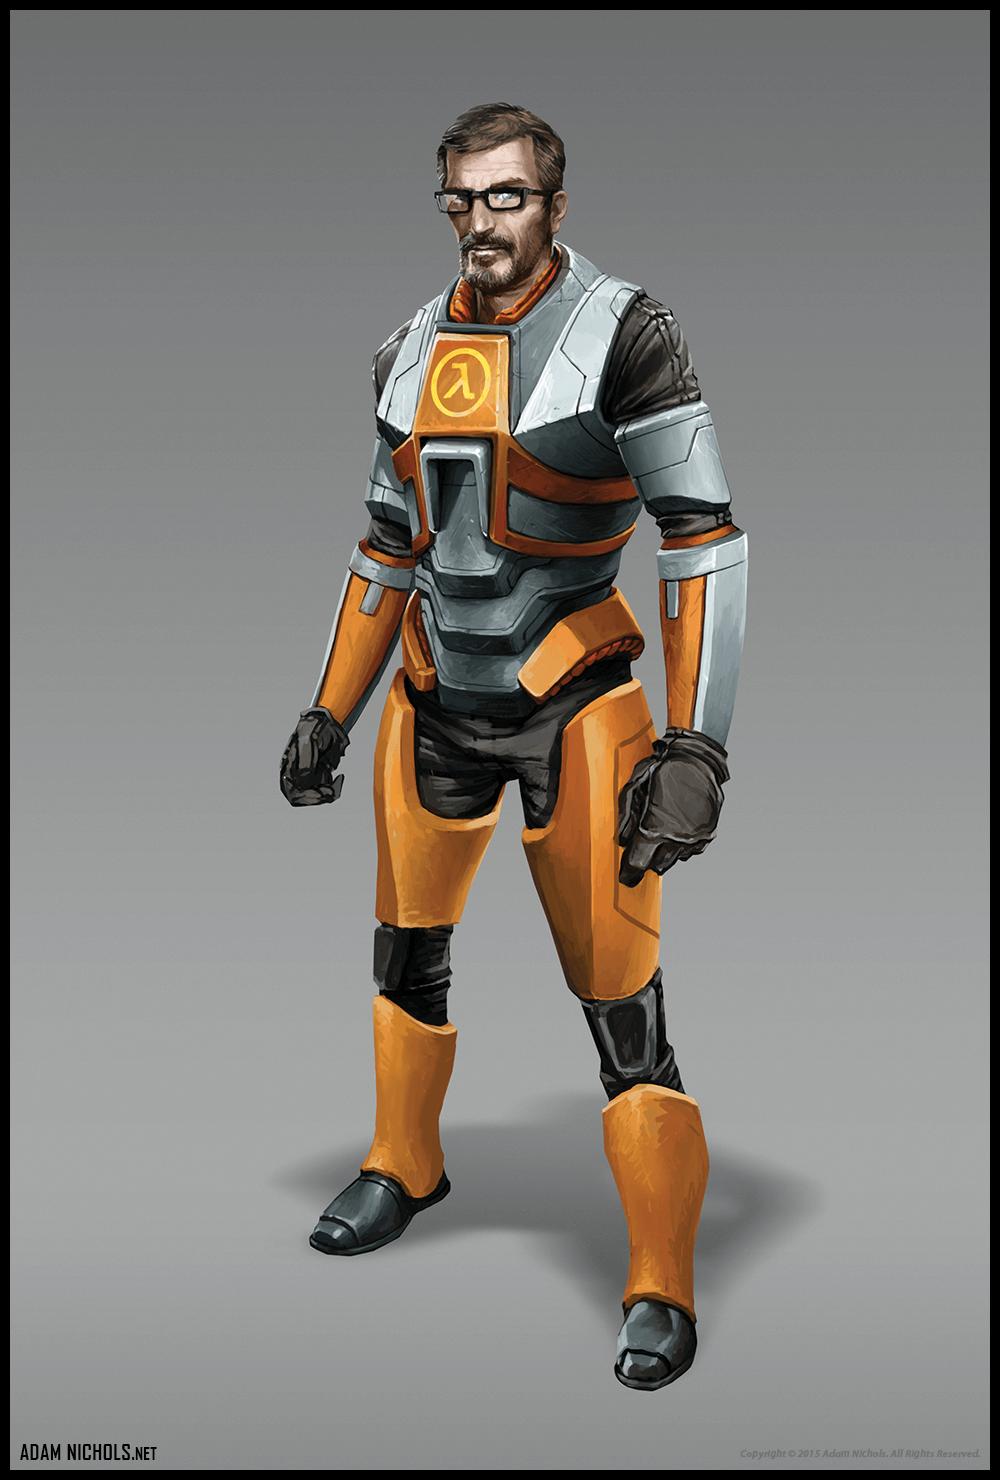 Halflife 3 Gordan Freeman Concept Art - Artwork by Adam Nichols